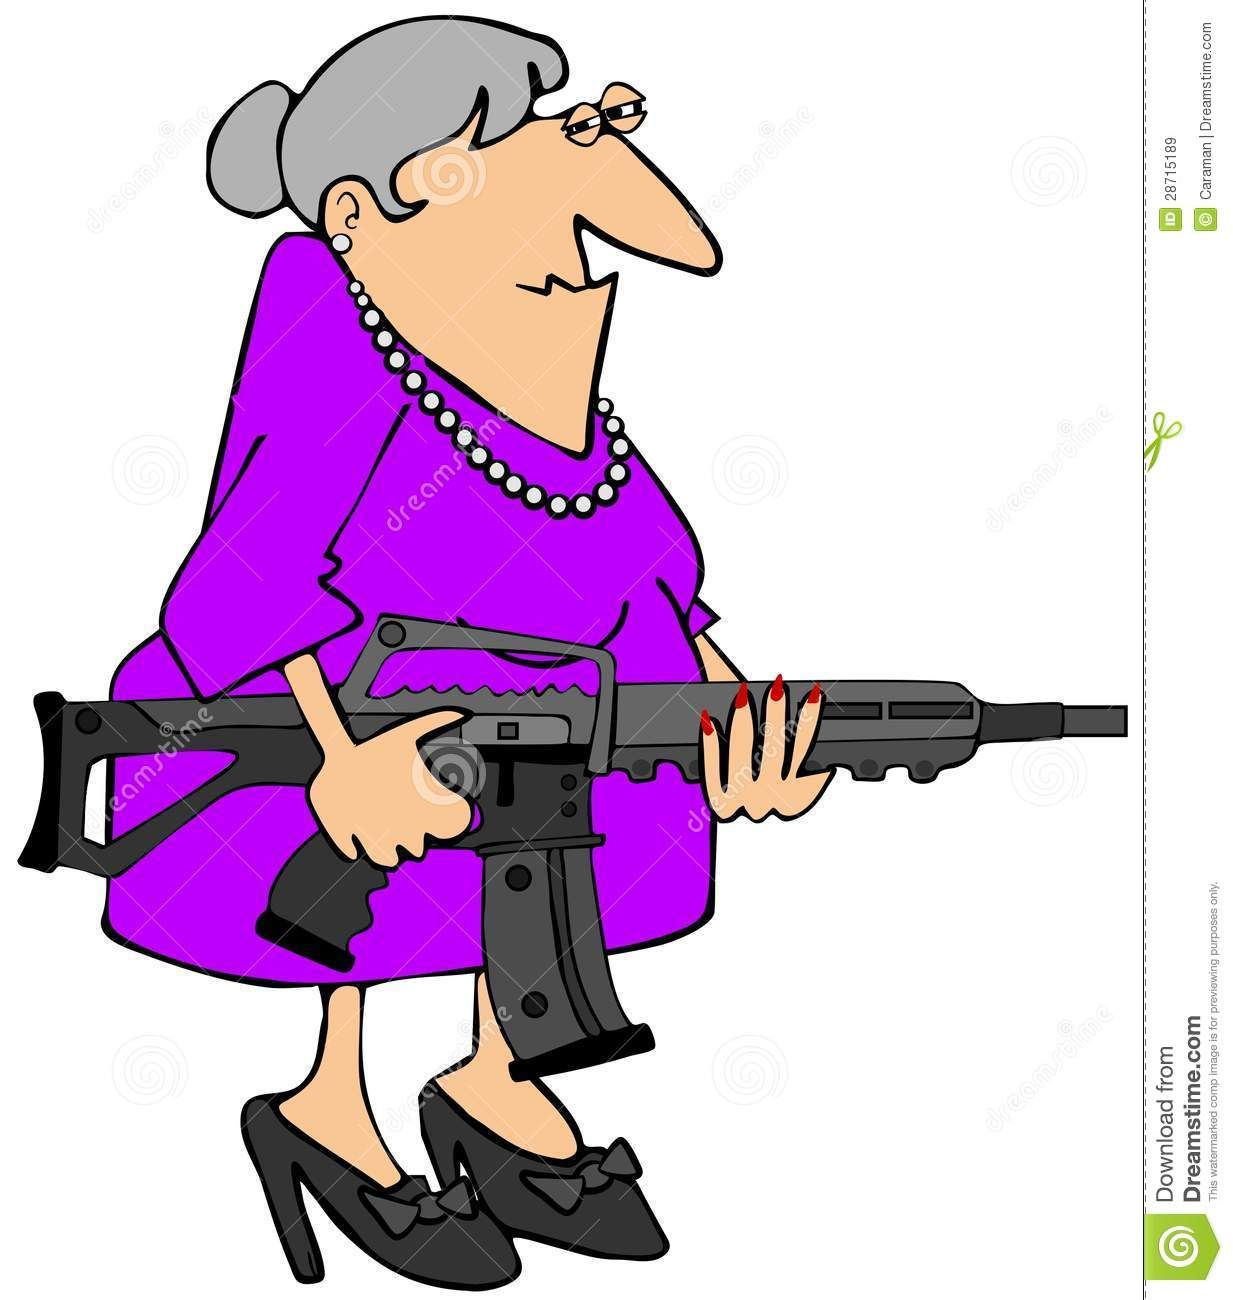 cartoon grandma clipart free clip art images my style rh pinterest com grandma clipart black and white grandma clipart face